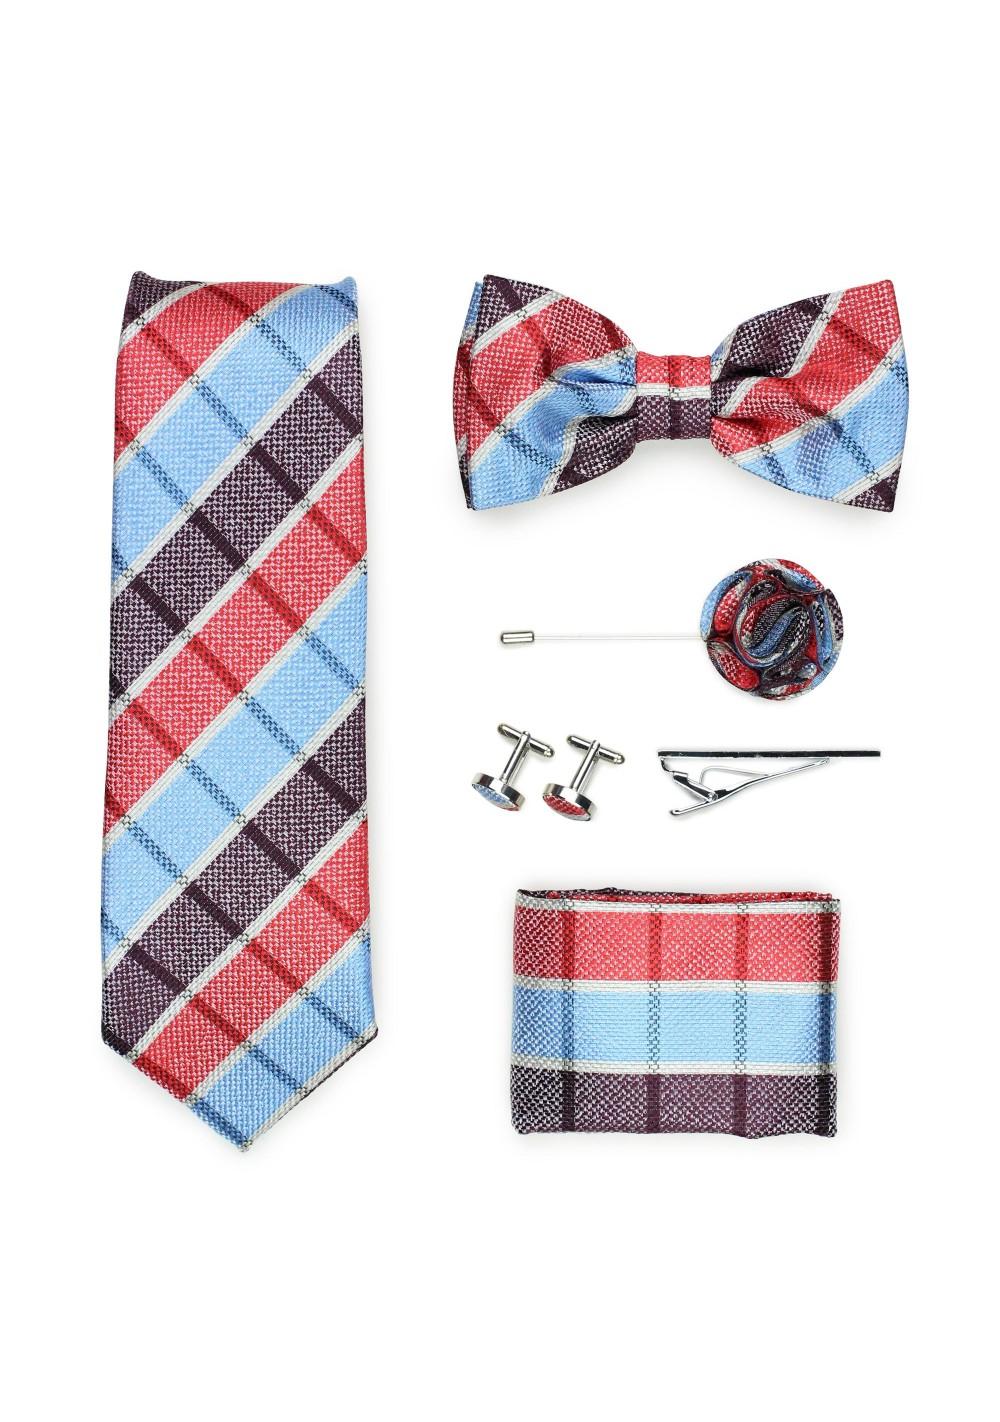 madras plaid menswear tie gift set